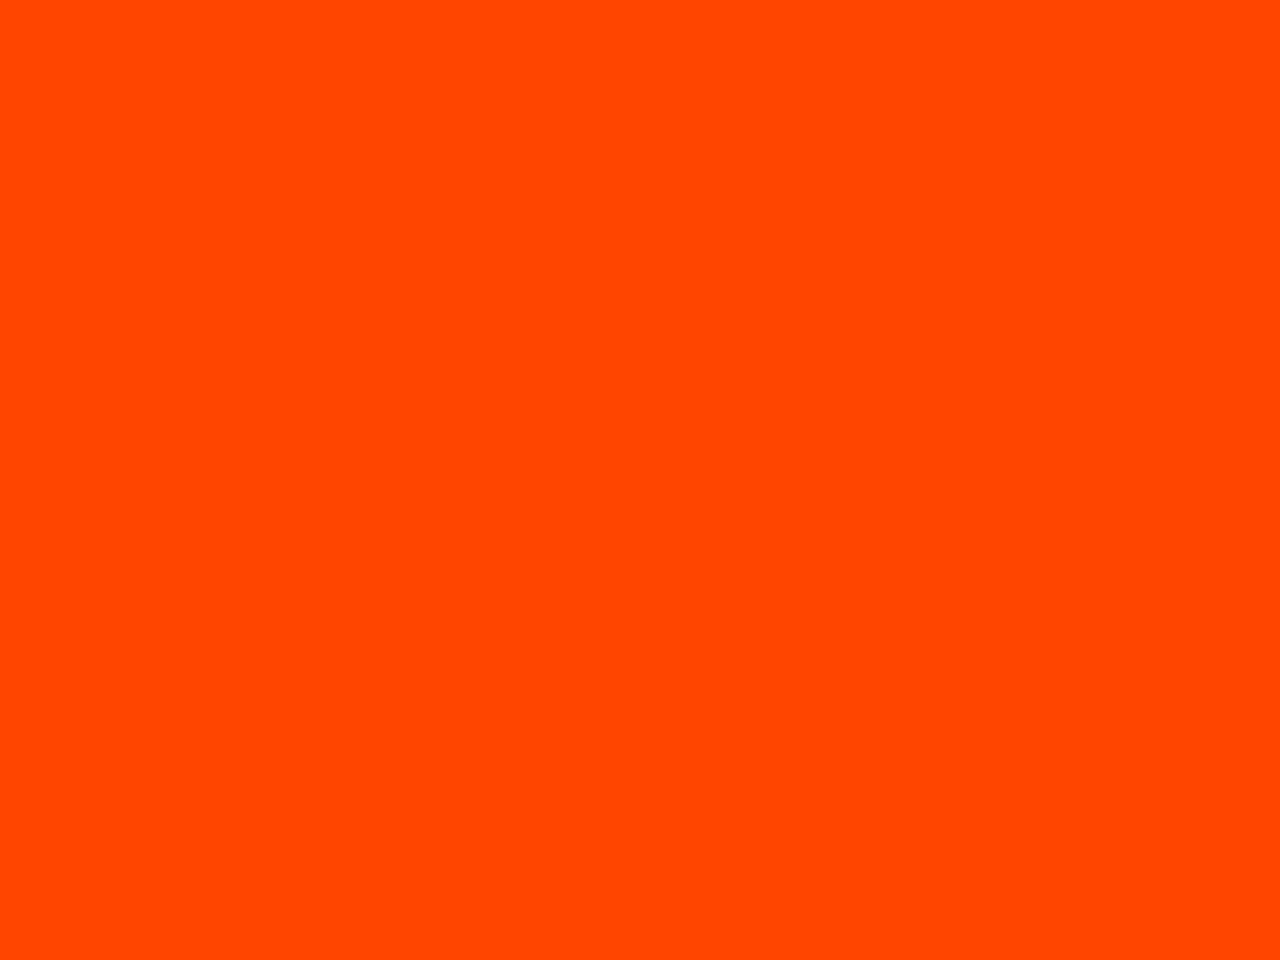 1280x960 Orange-red Solid Color Background